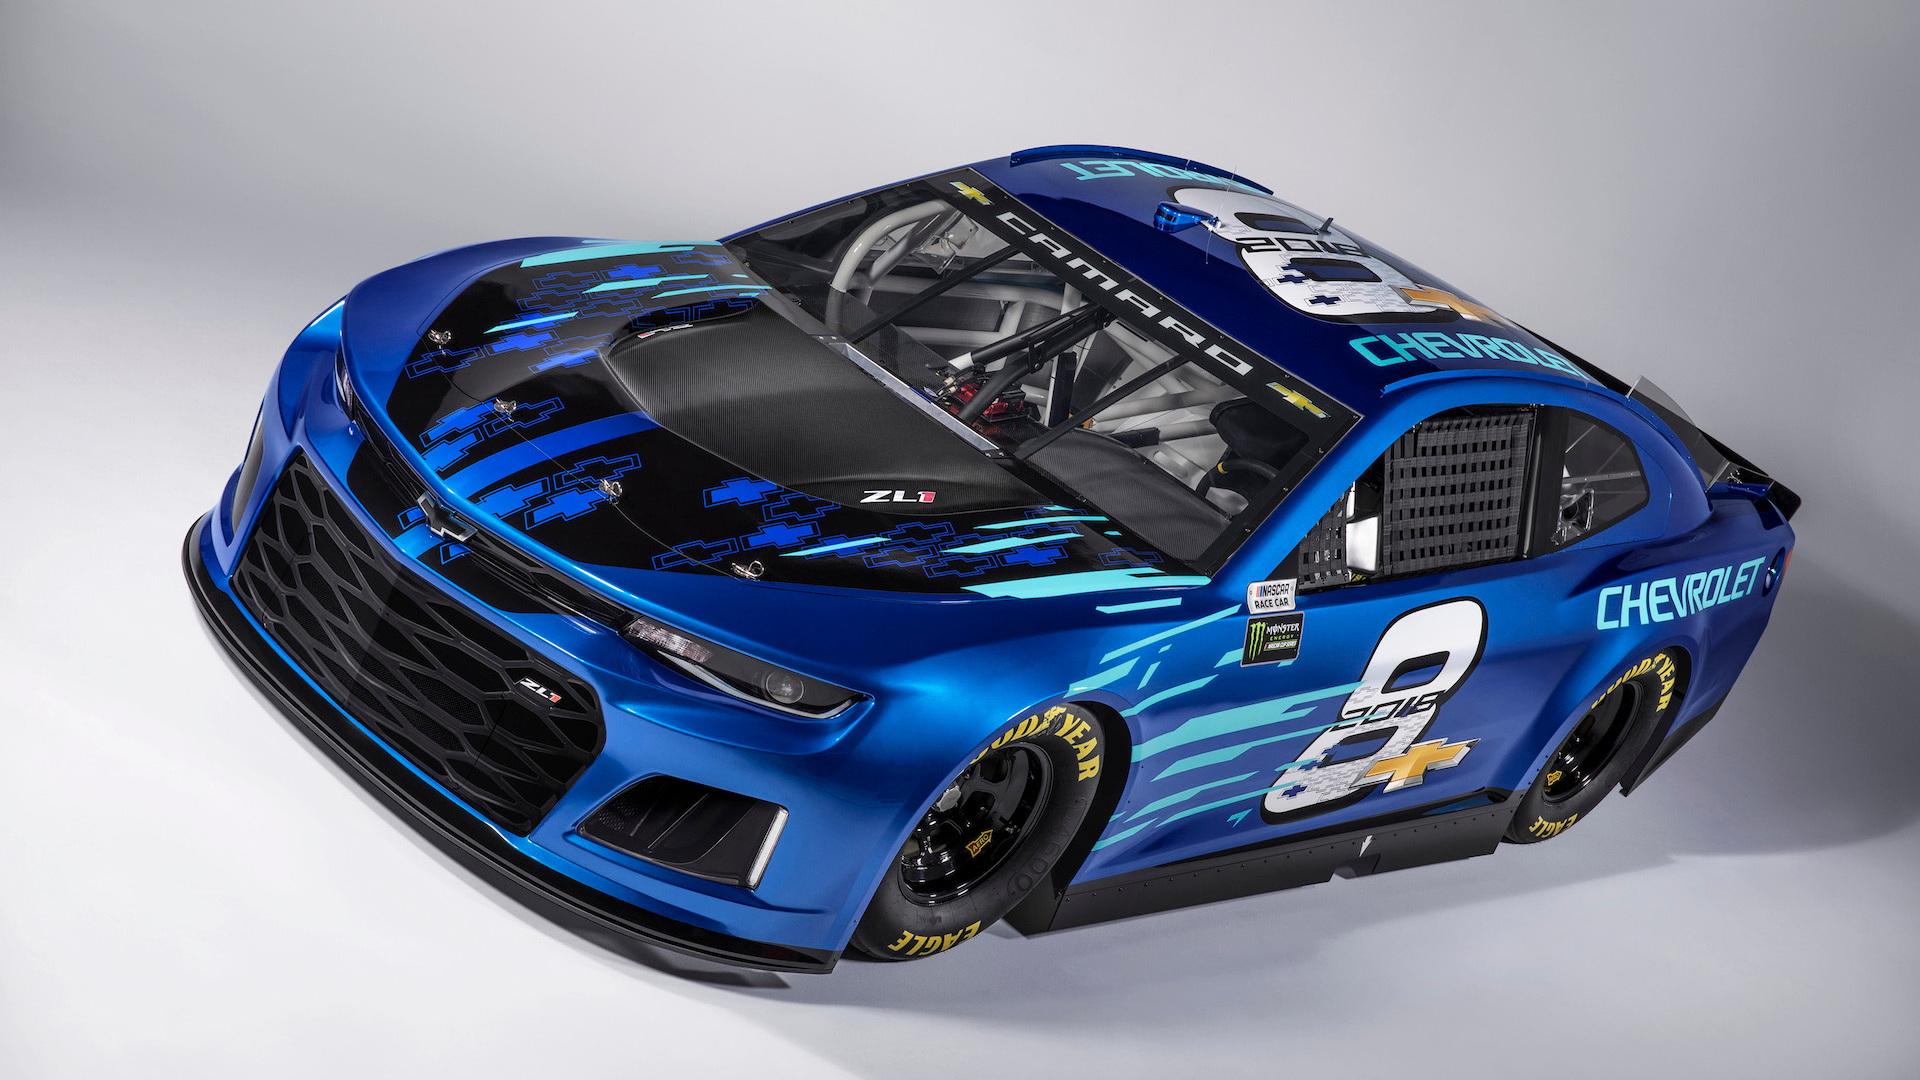 2018 Chevrolet Camaro ZL1 NASCAR race car